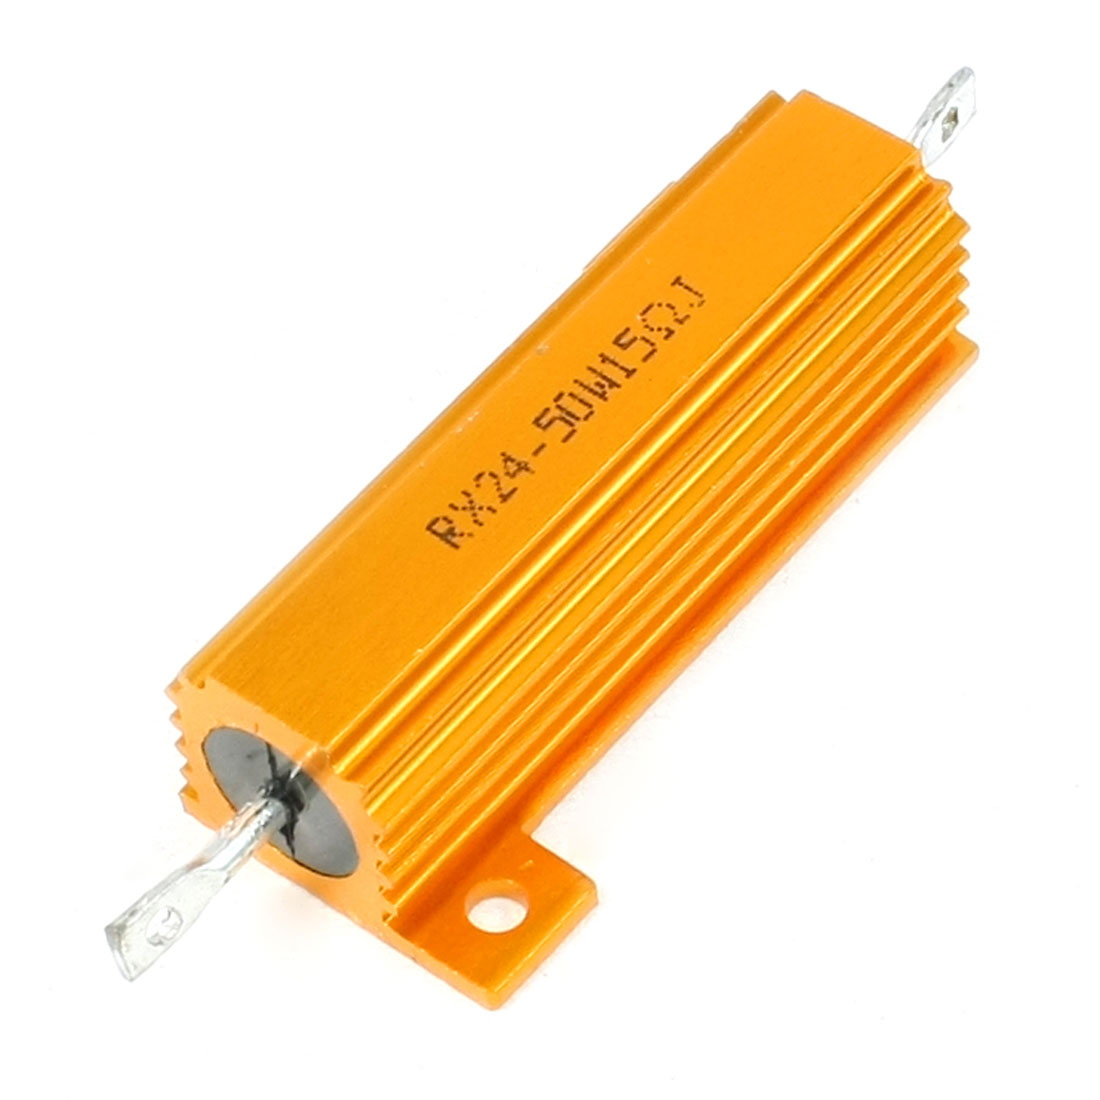 Gold Tone Screw Tabs Aluminum Housed 50W 5% 15 Ohm Resistors